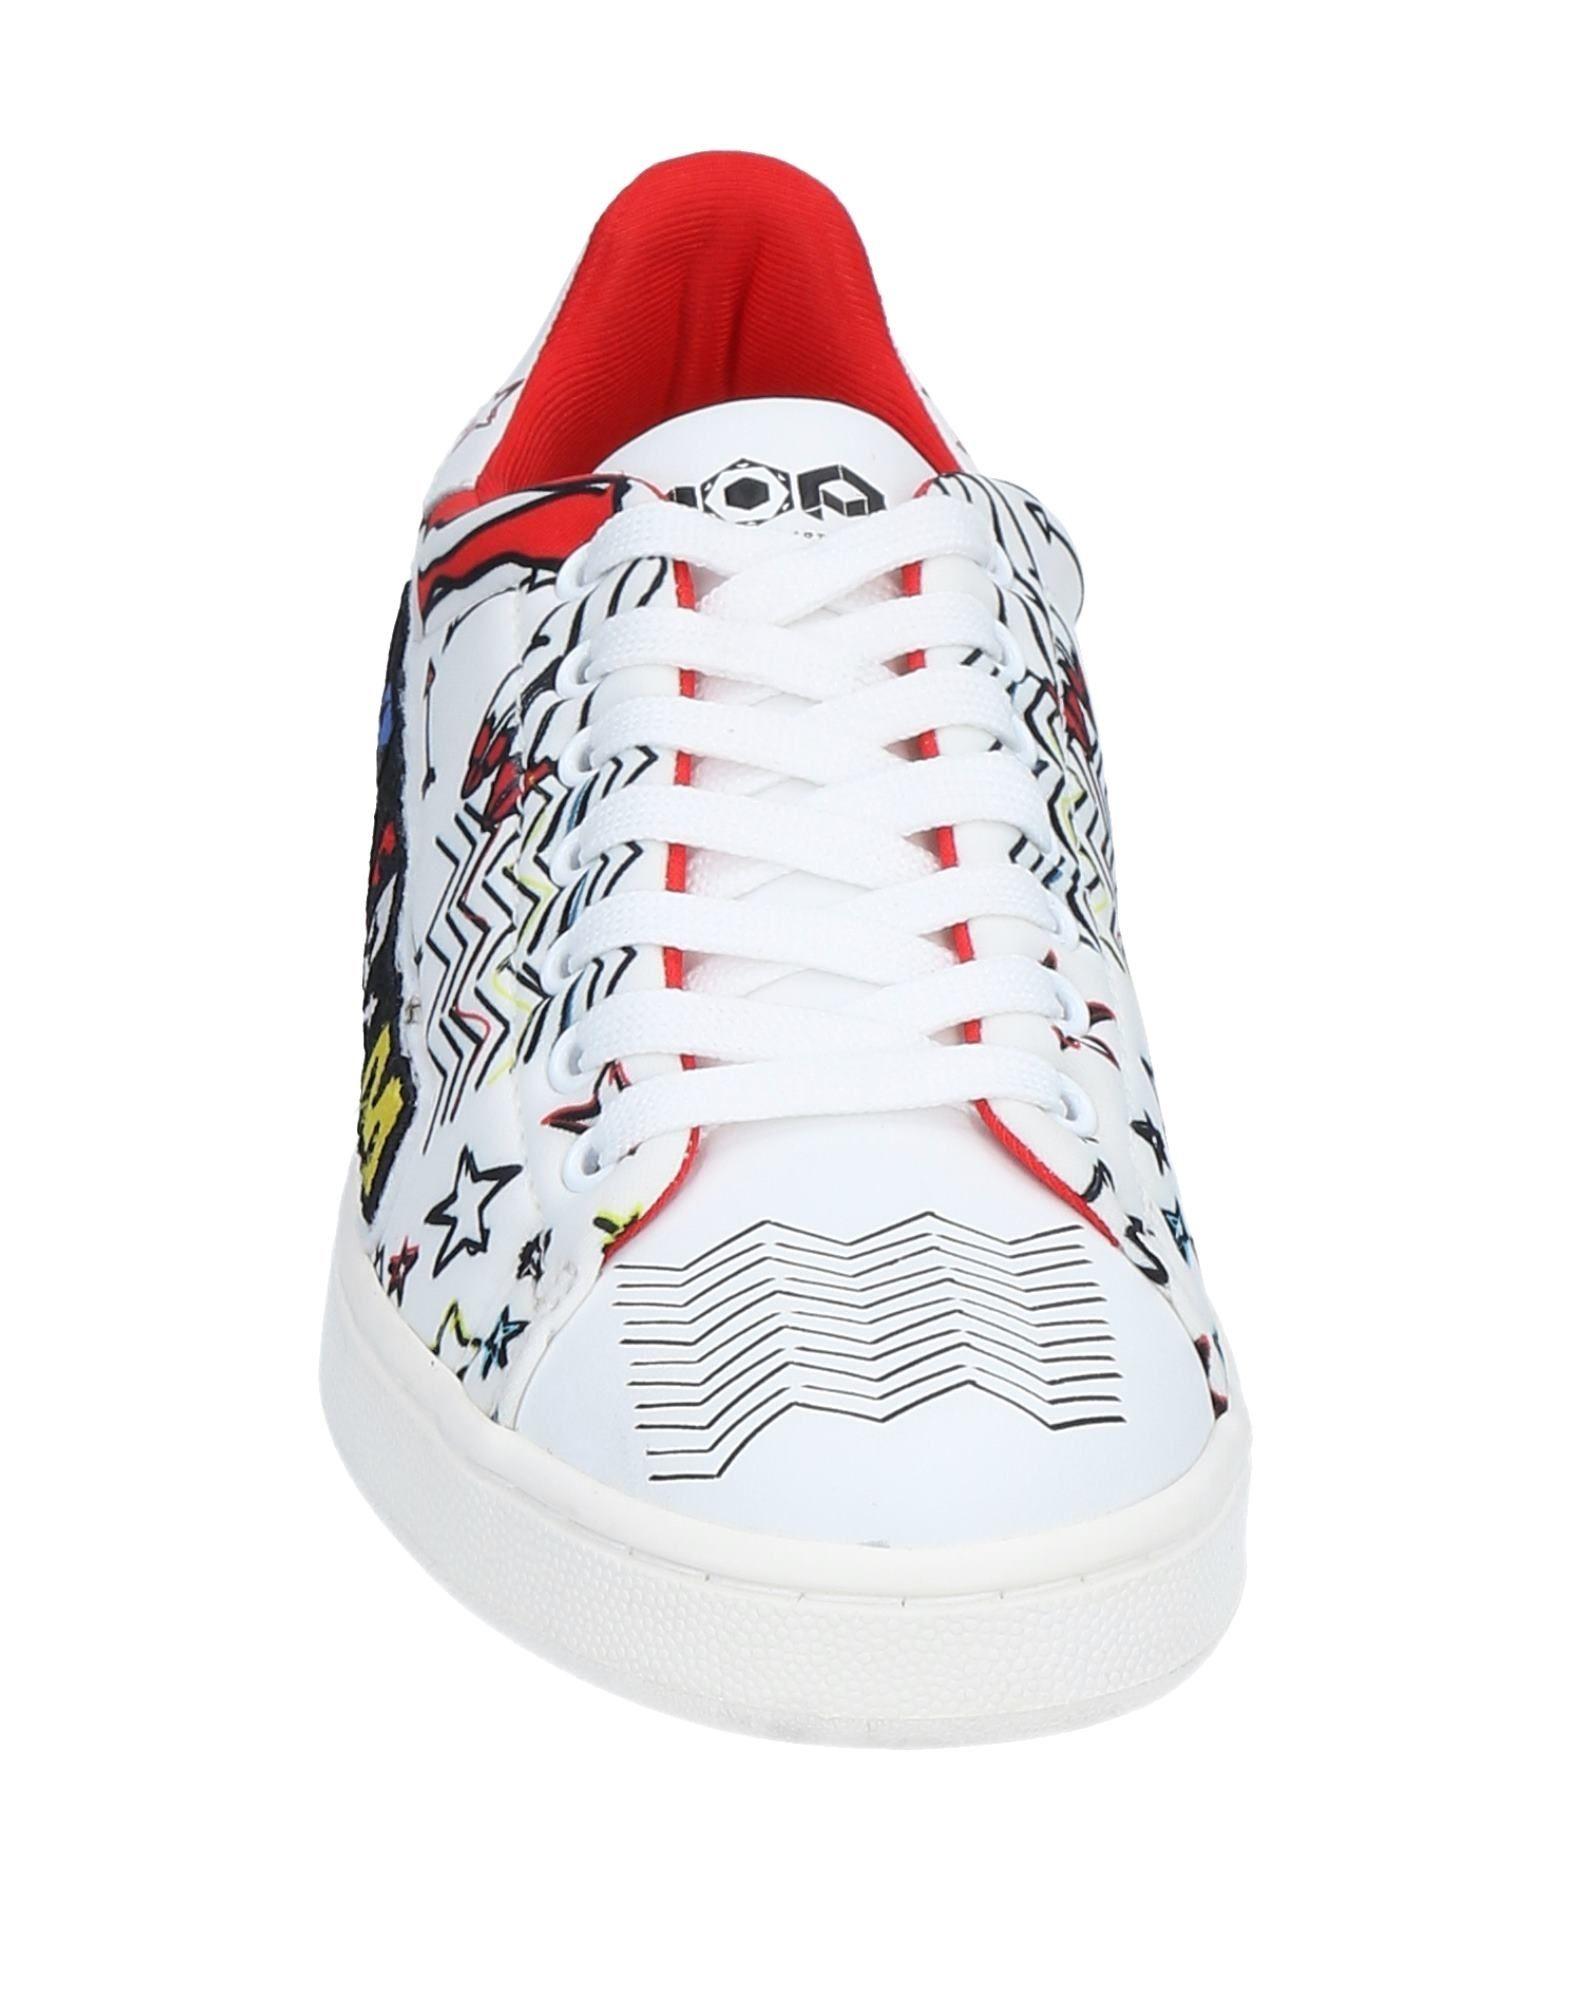 Gut Arts um billige Schuhe zu tragenMoa Master Of Arts Gut Sneakers Damen  11533958RK 082ede